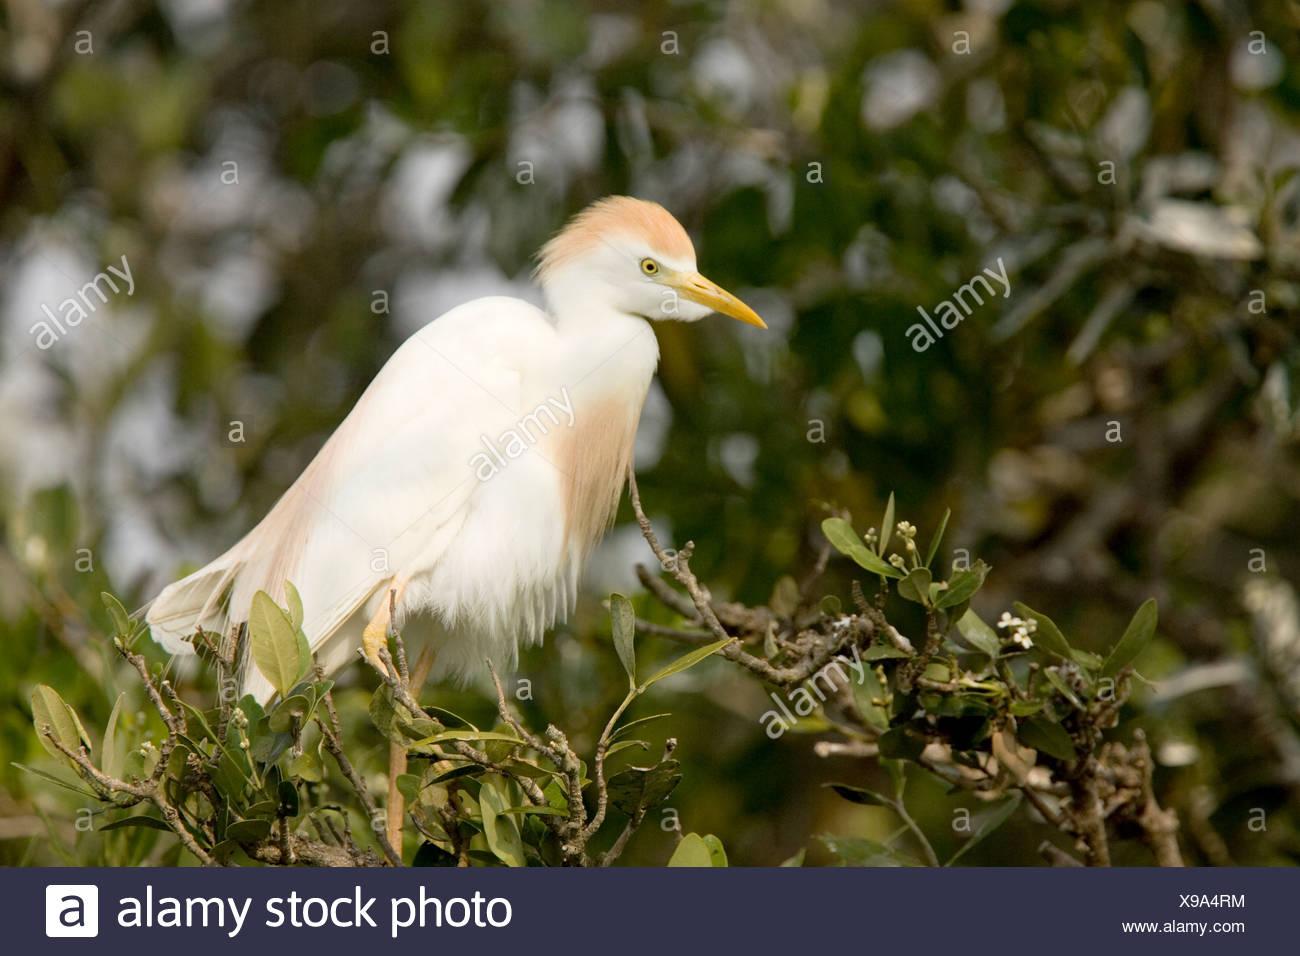 A Cattle Egret (Bubulcus ibis) in breeding plumage. Stock Photo